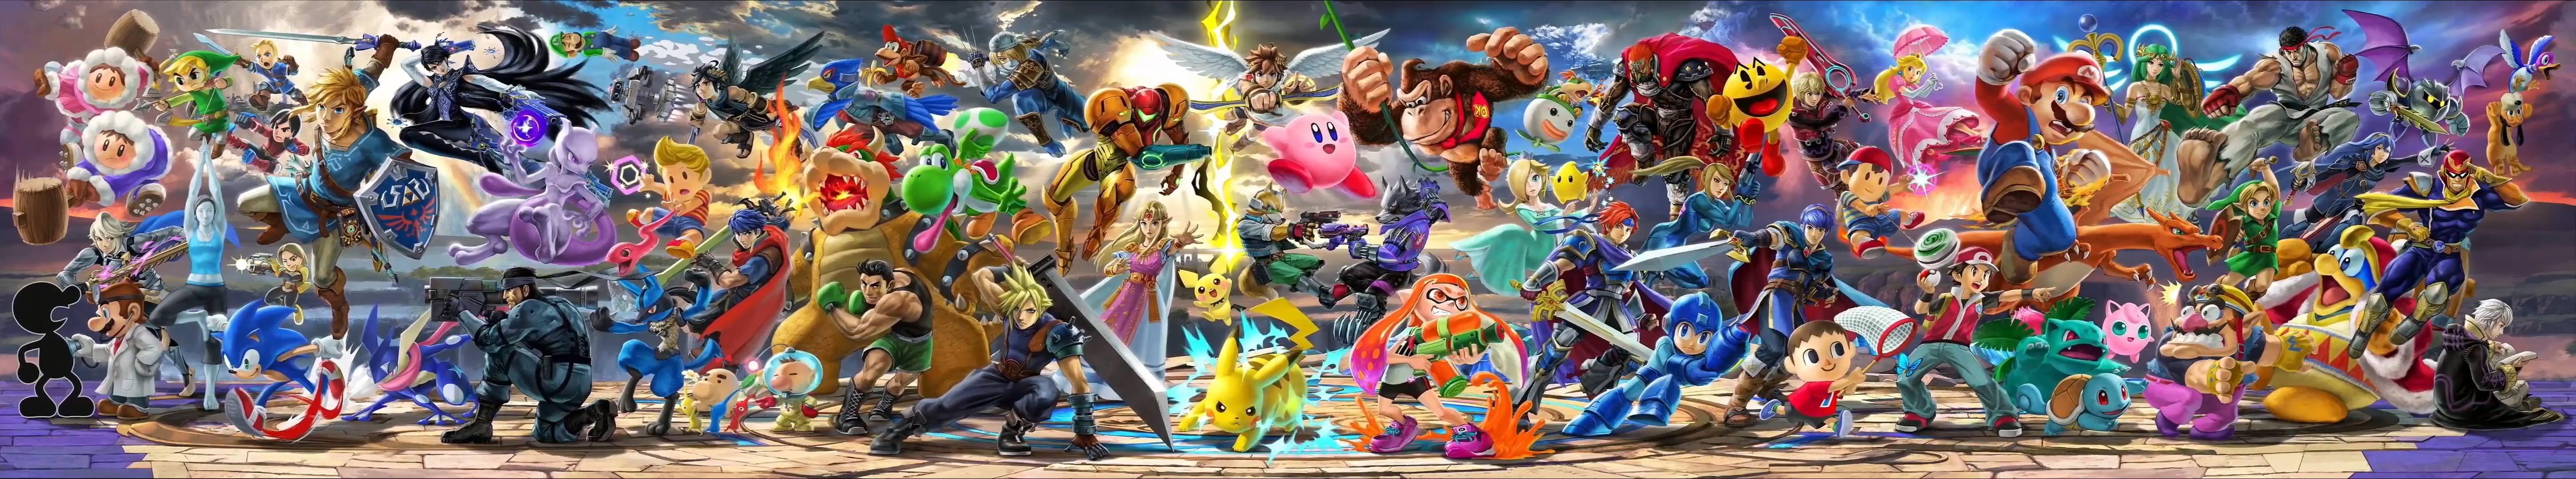 Smash Bros Ultimate Desktop Background Posted By John Thompson